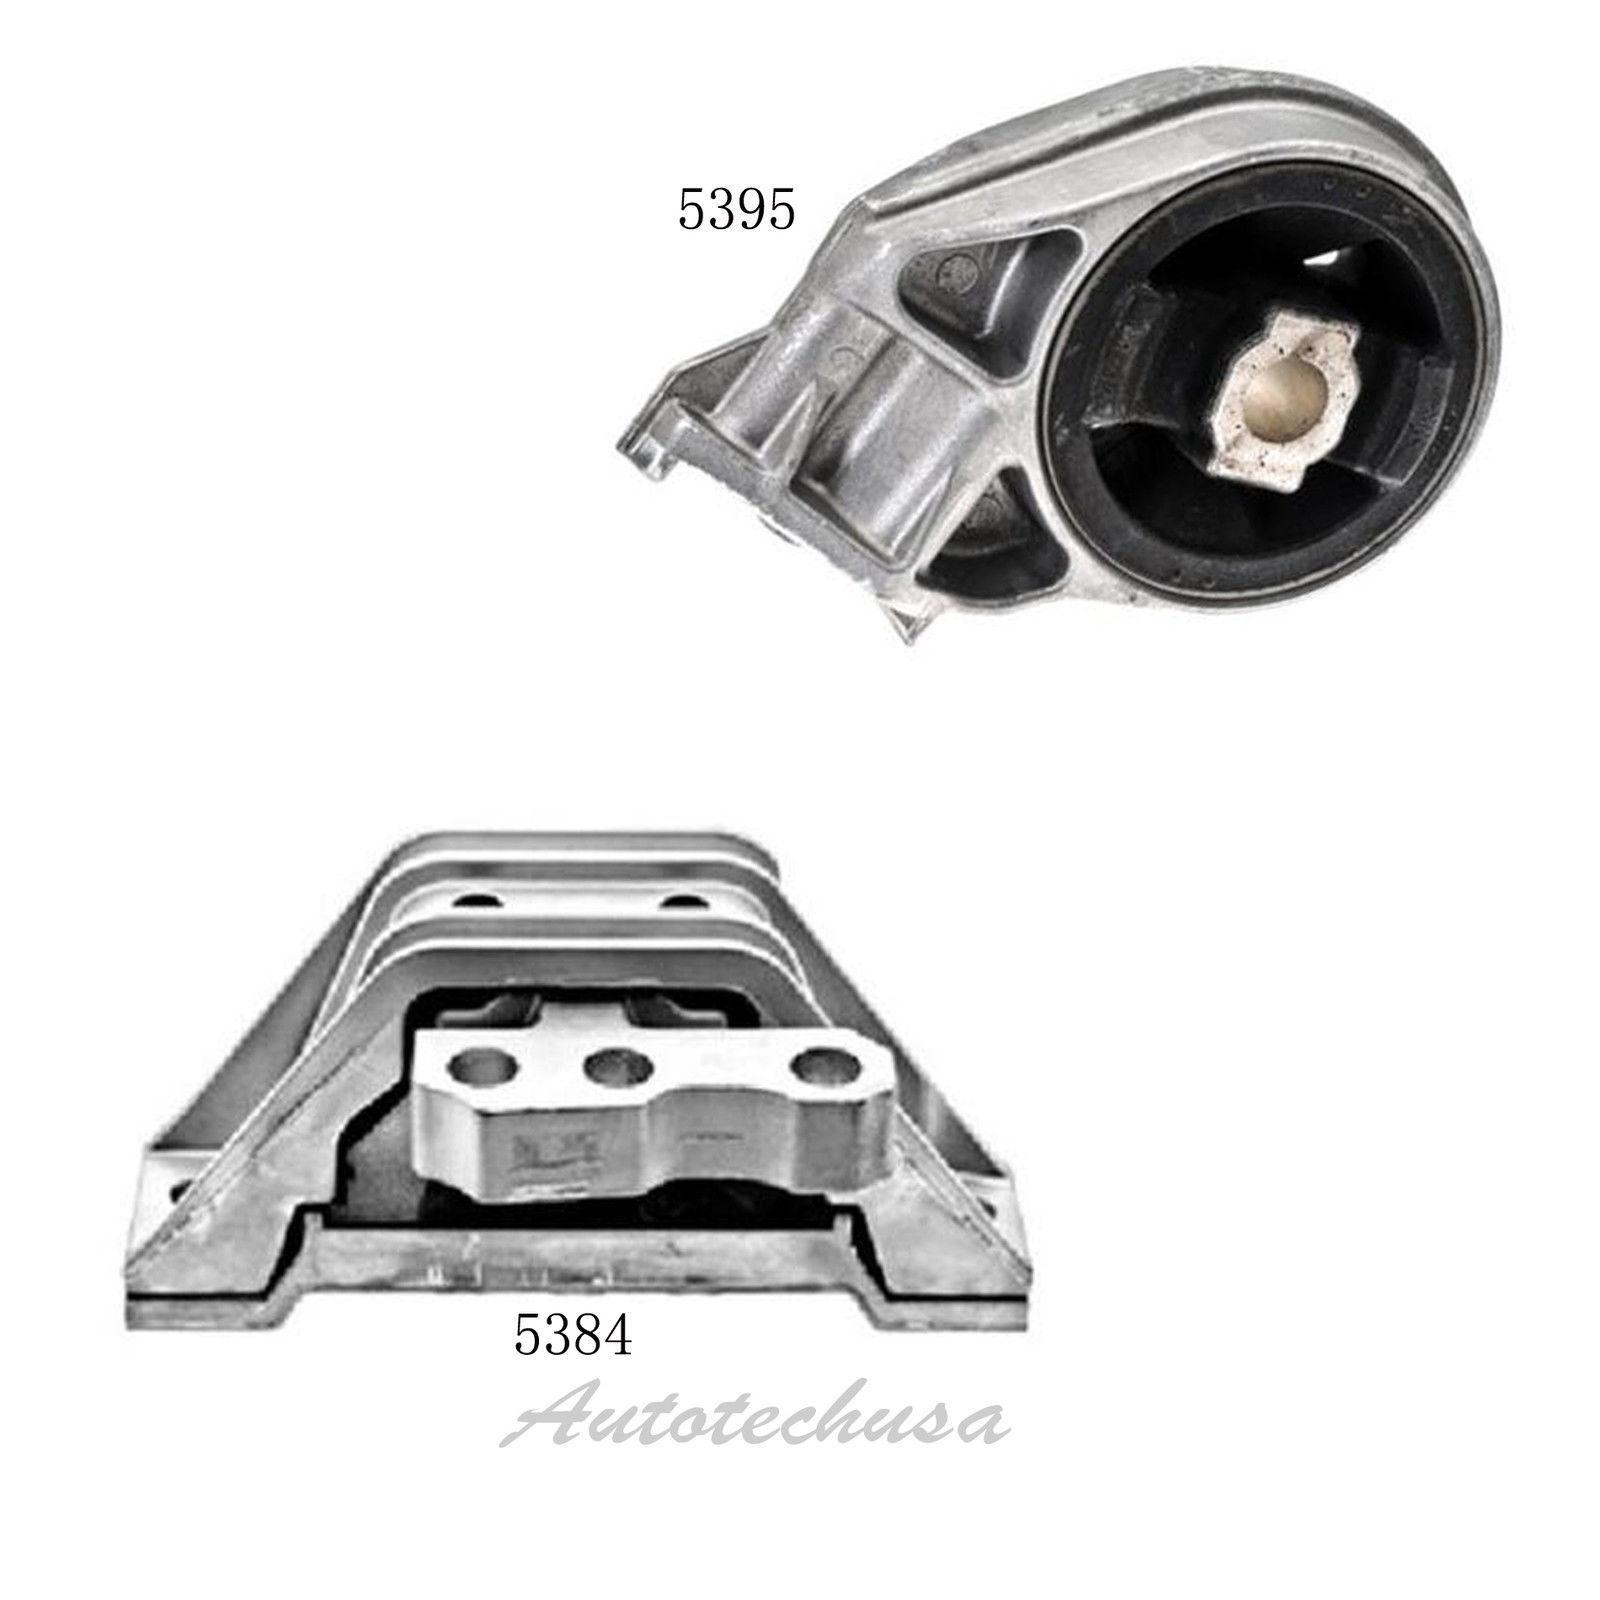 New For Saturn Vue Chevrolet Cobalt 5384 Front Right Engine Motor Mount MT